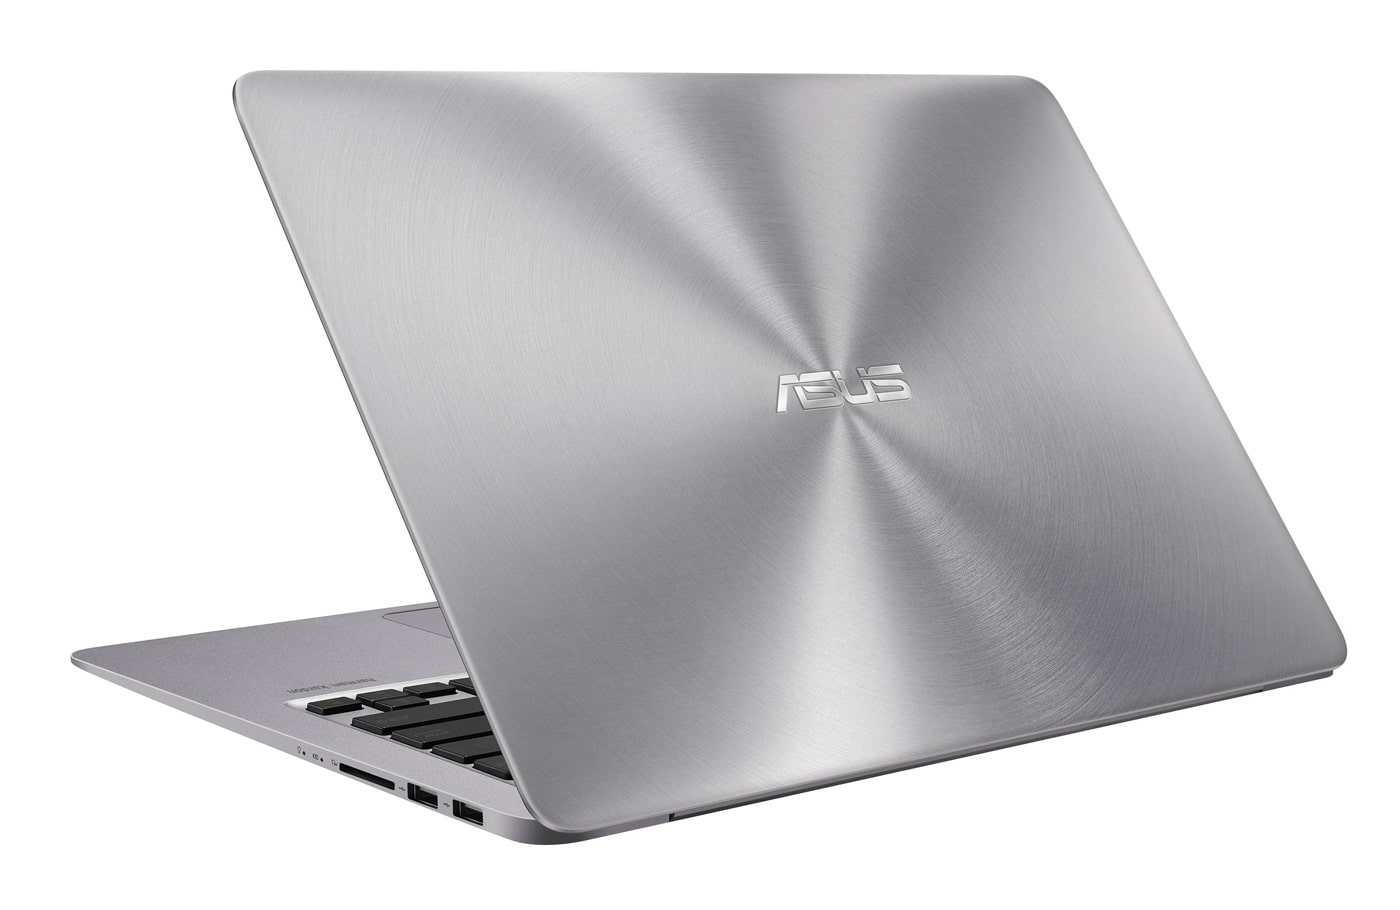 Asus Zenbook UX310UQ-GL055T, Ultrabook 13 pouces i7 SSD 940MX 8Go ... 0c31c778d4da